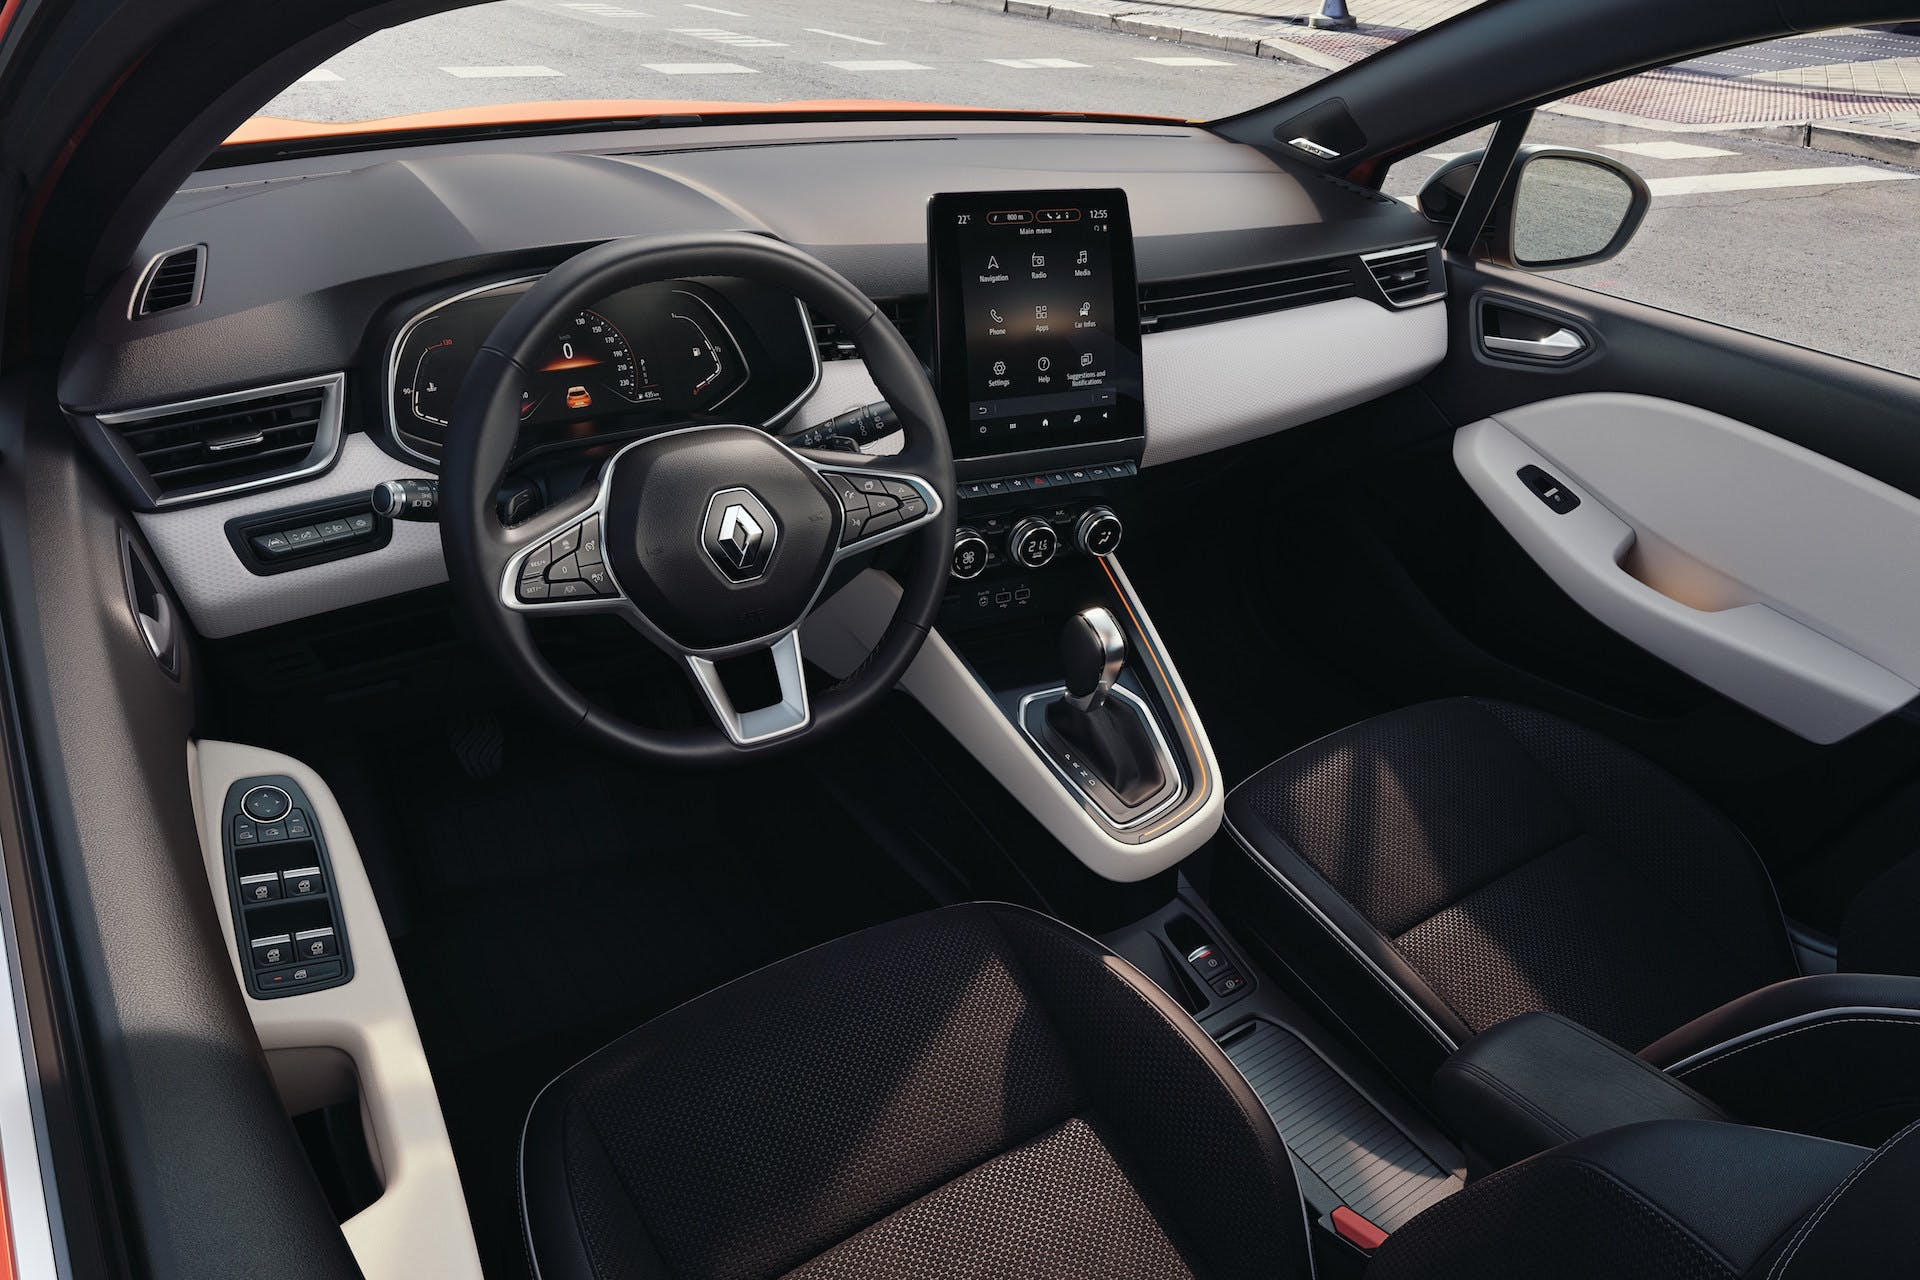 Nuova Renault Clio plancia